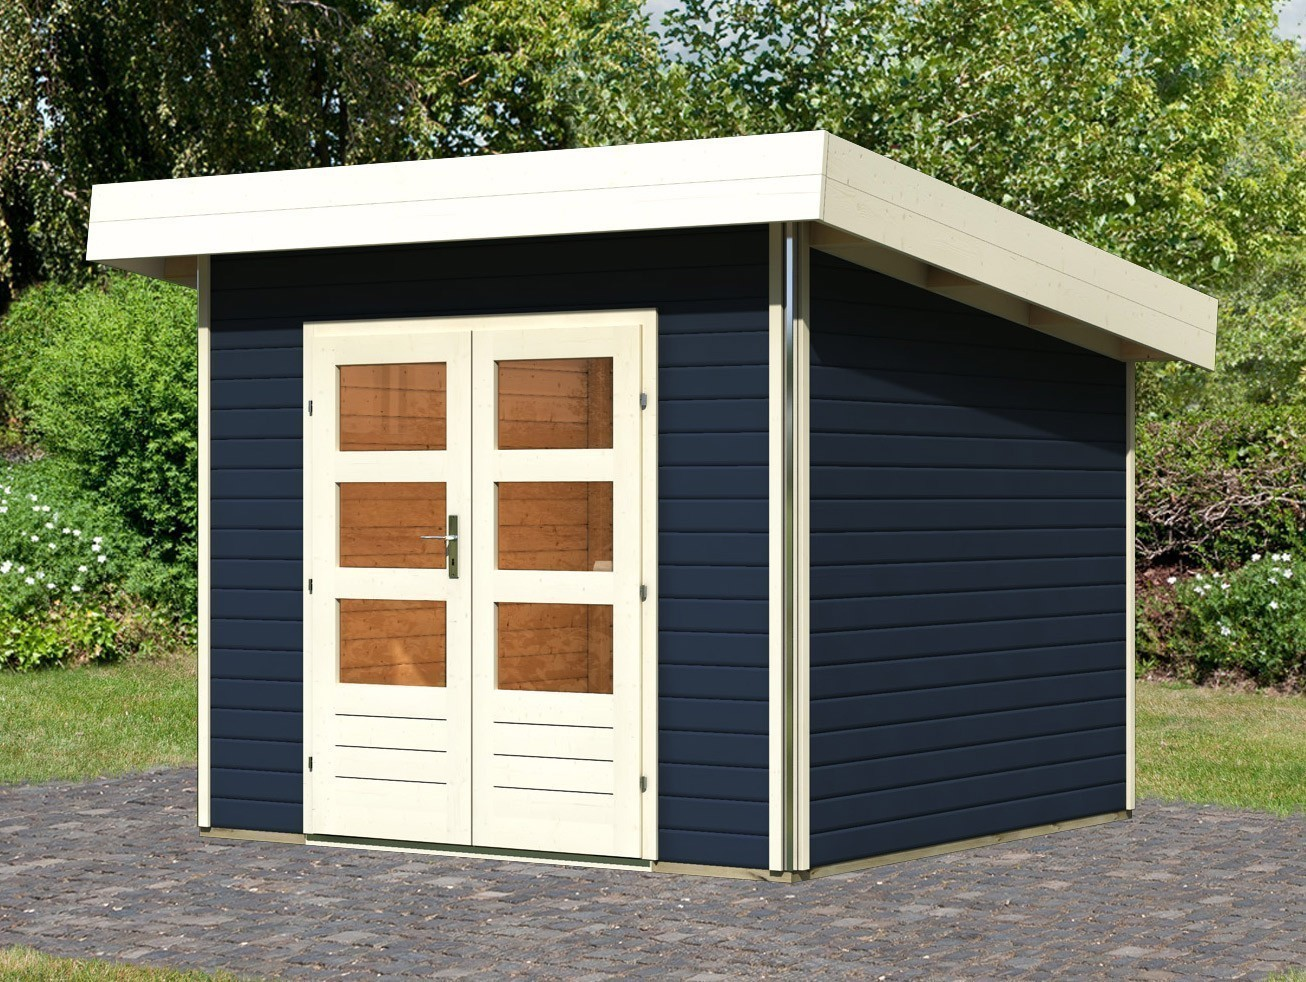 karibu gartenhaus 40mm moosburg 1 grau 318x294cm bei. Black Bedroom Furniture Sets. Home Design Ideas